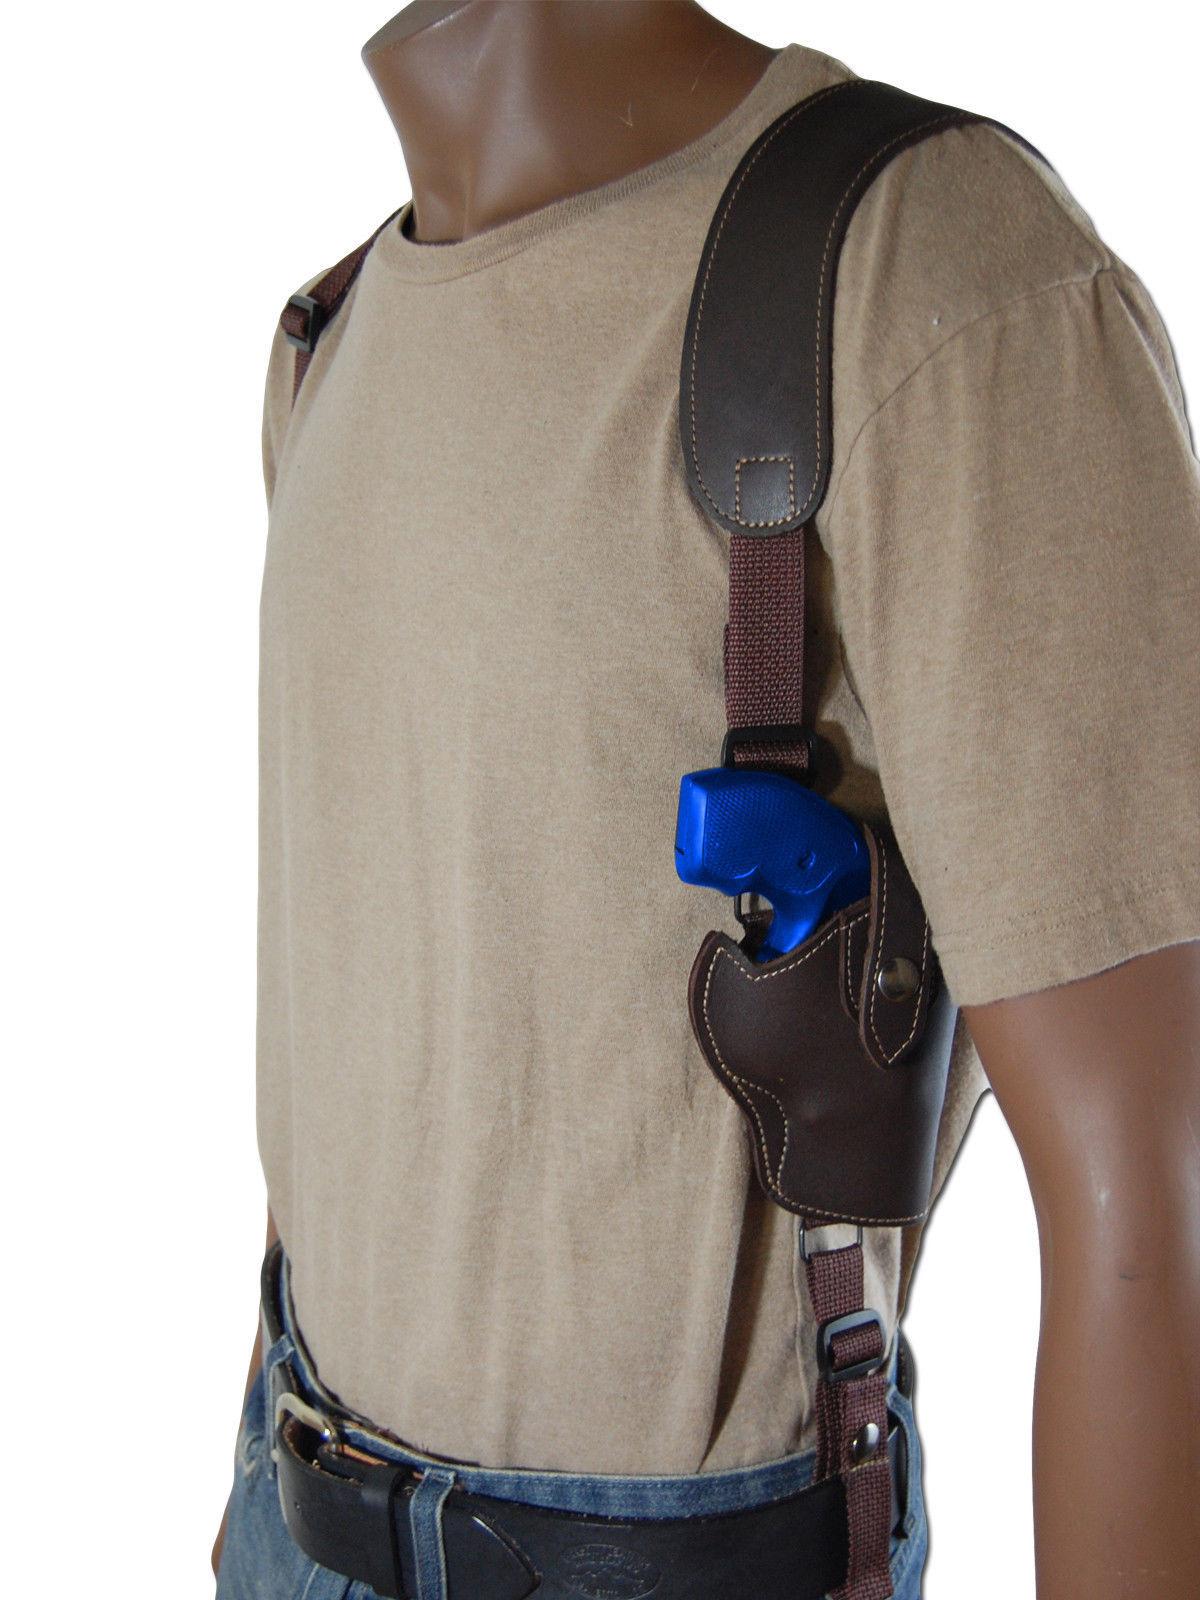 "NEW Barsony Brown Leather Vertical Gun Shoulder Holster for S&W 2"" Snub Nose Rev"